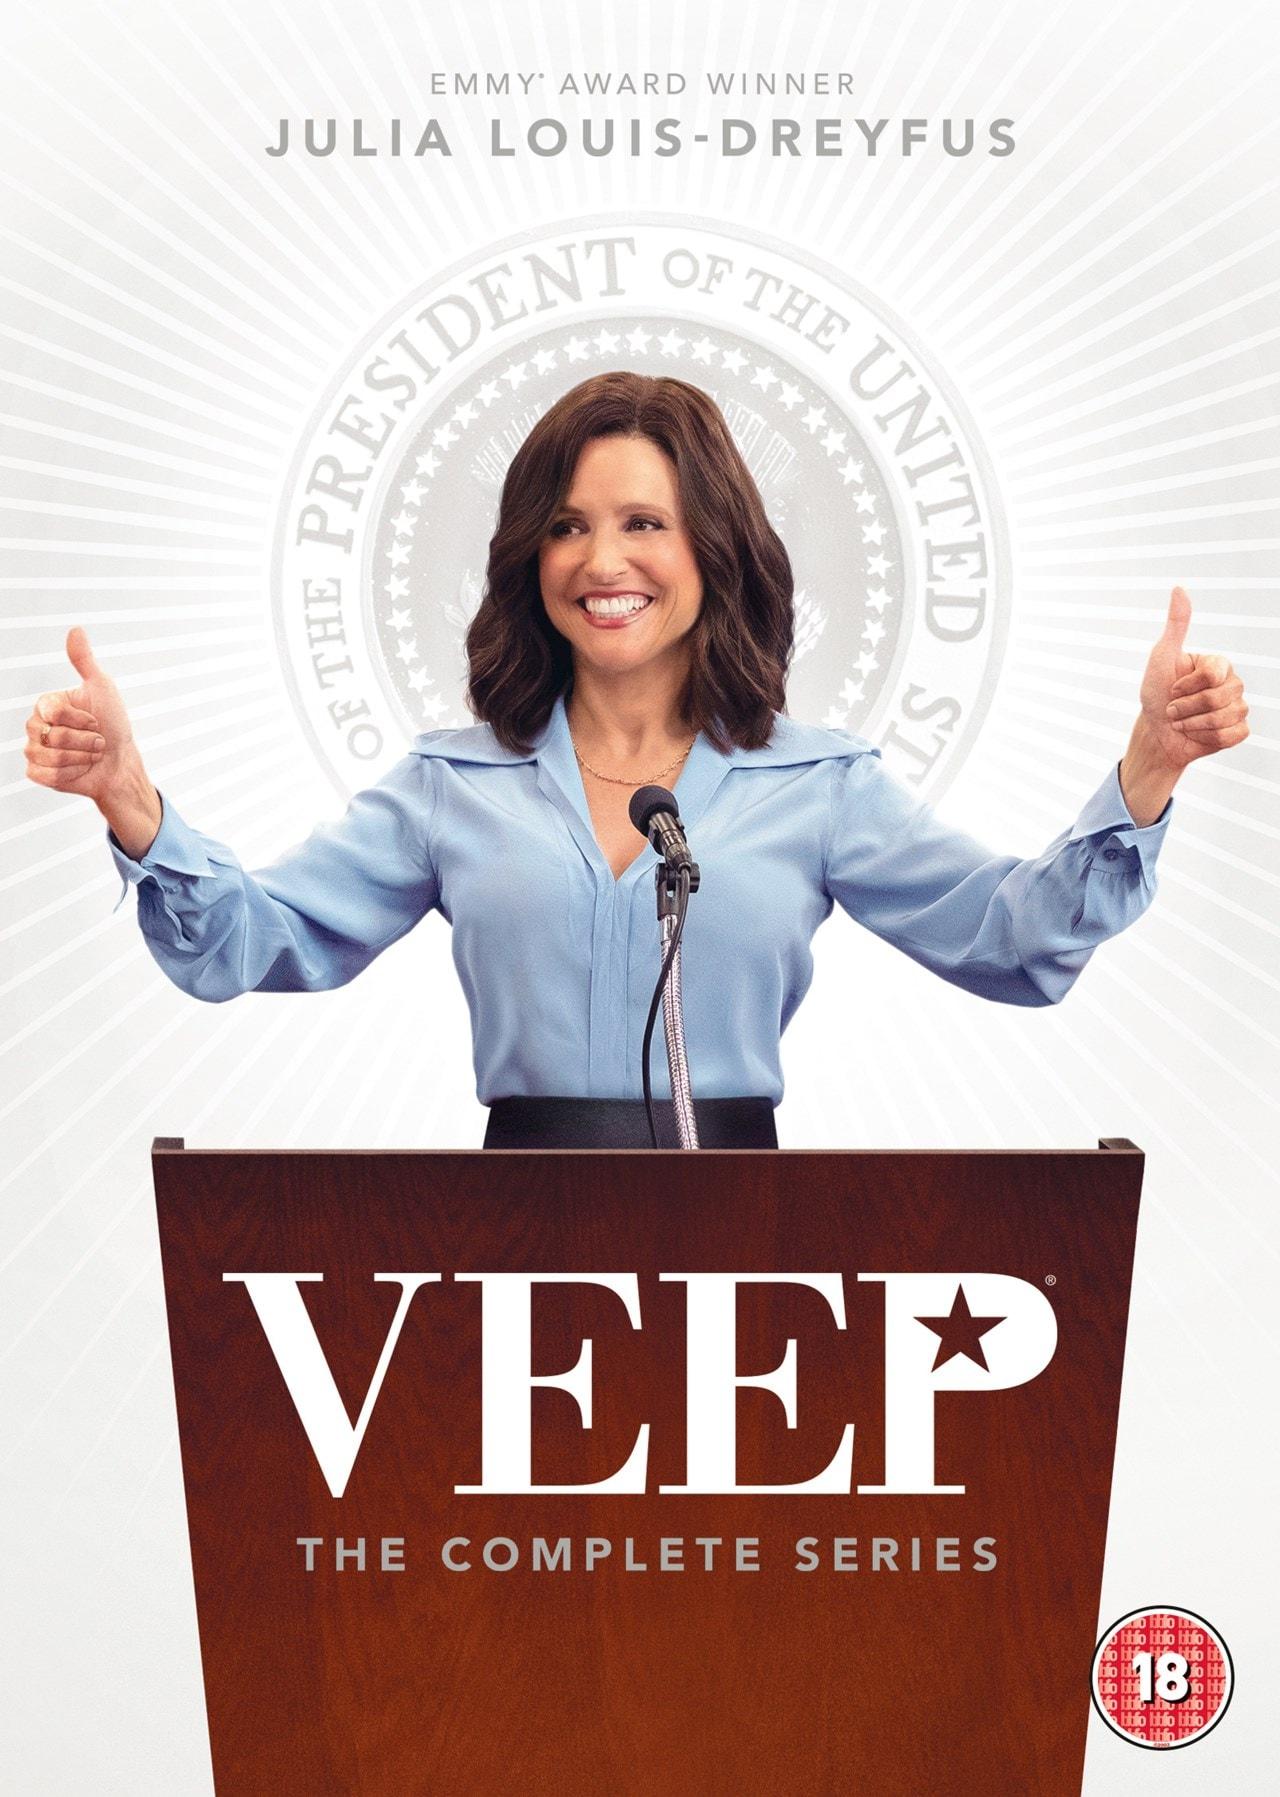 Veep: The Complete Series - 1